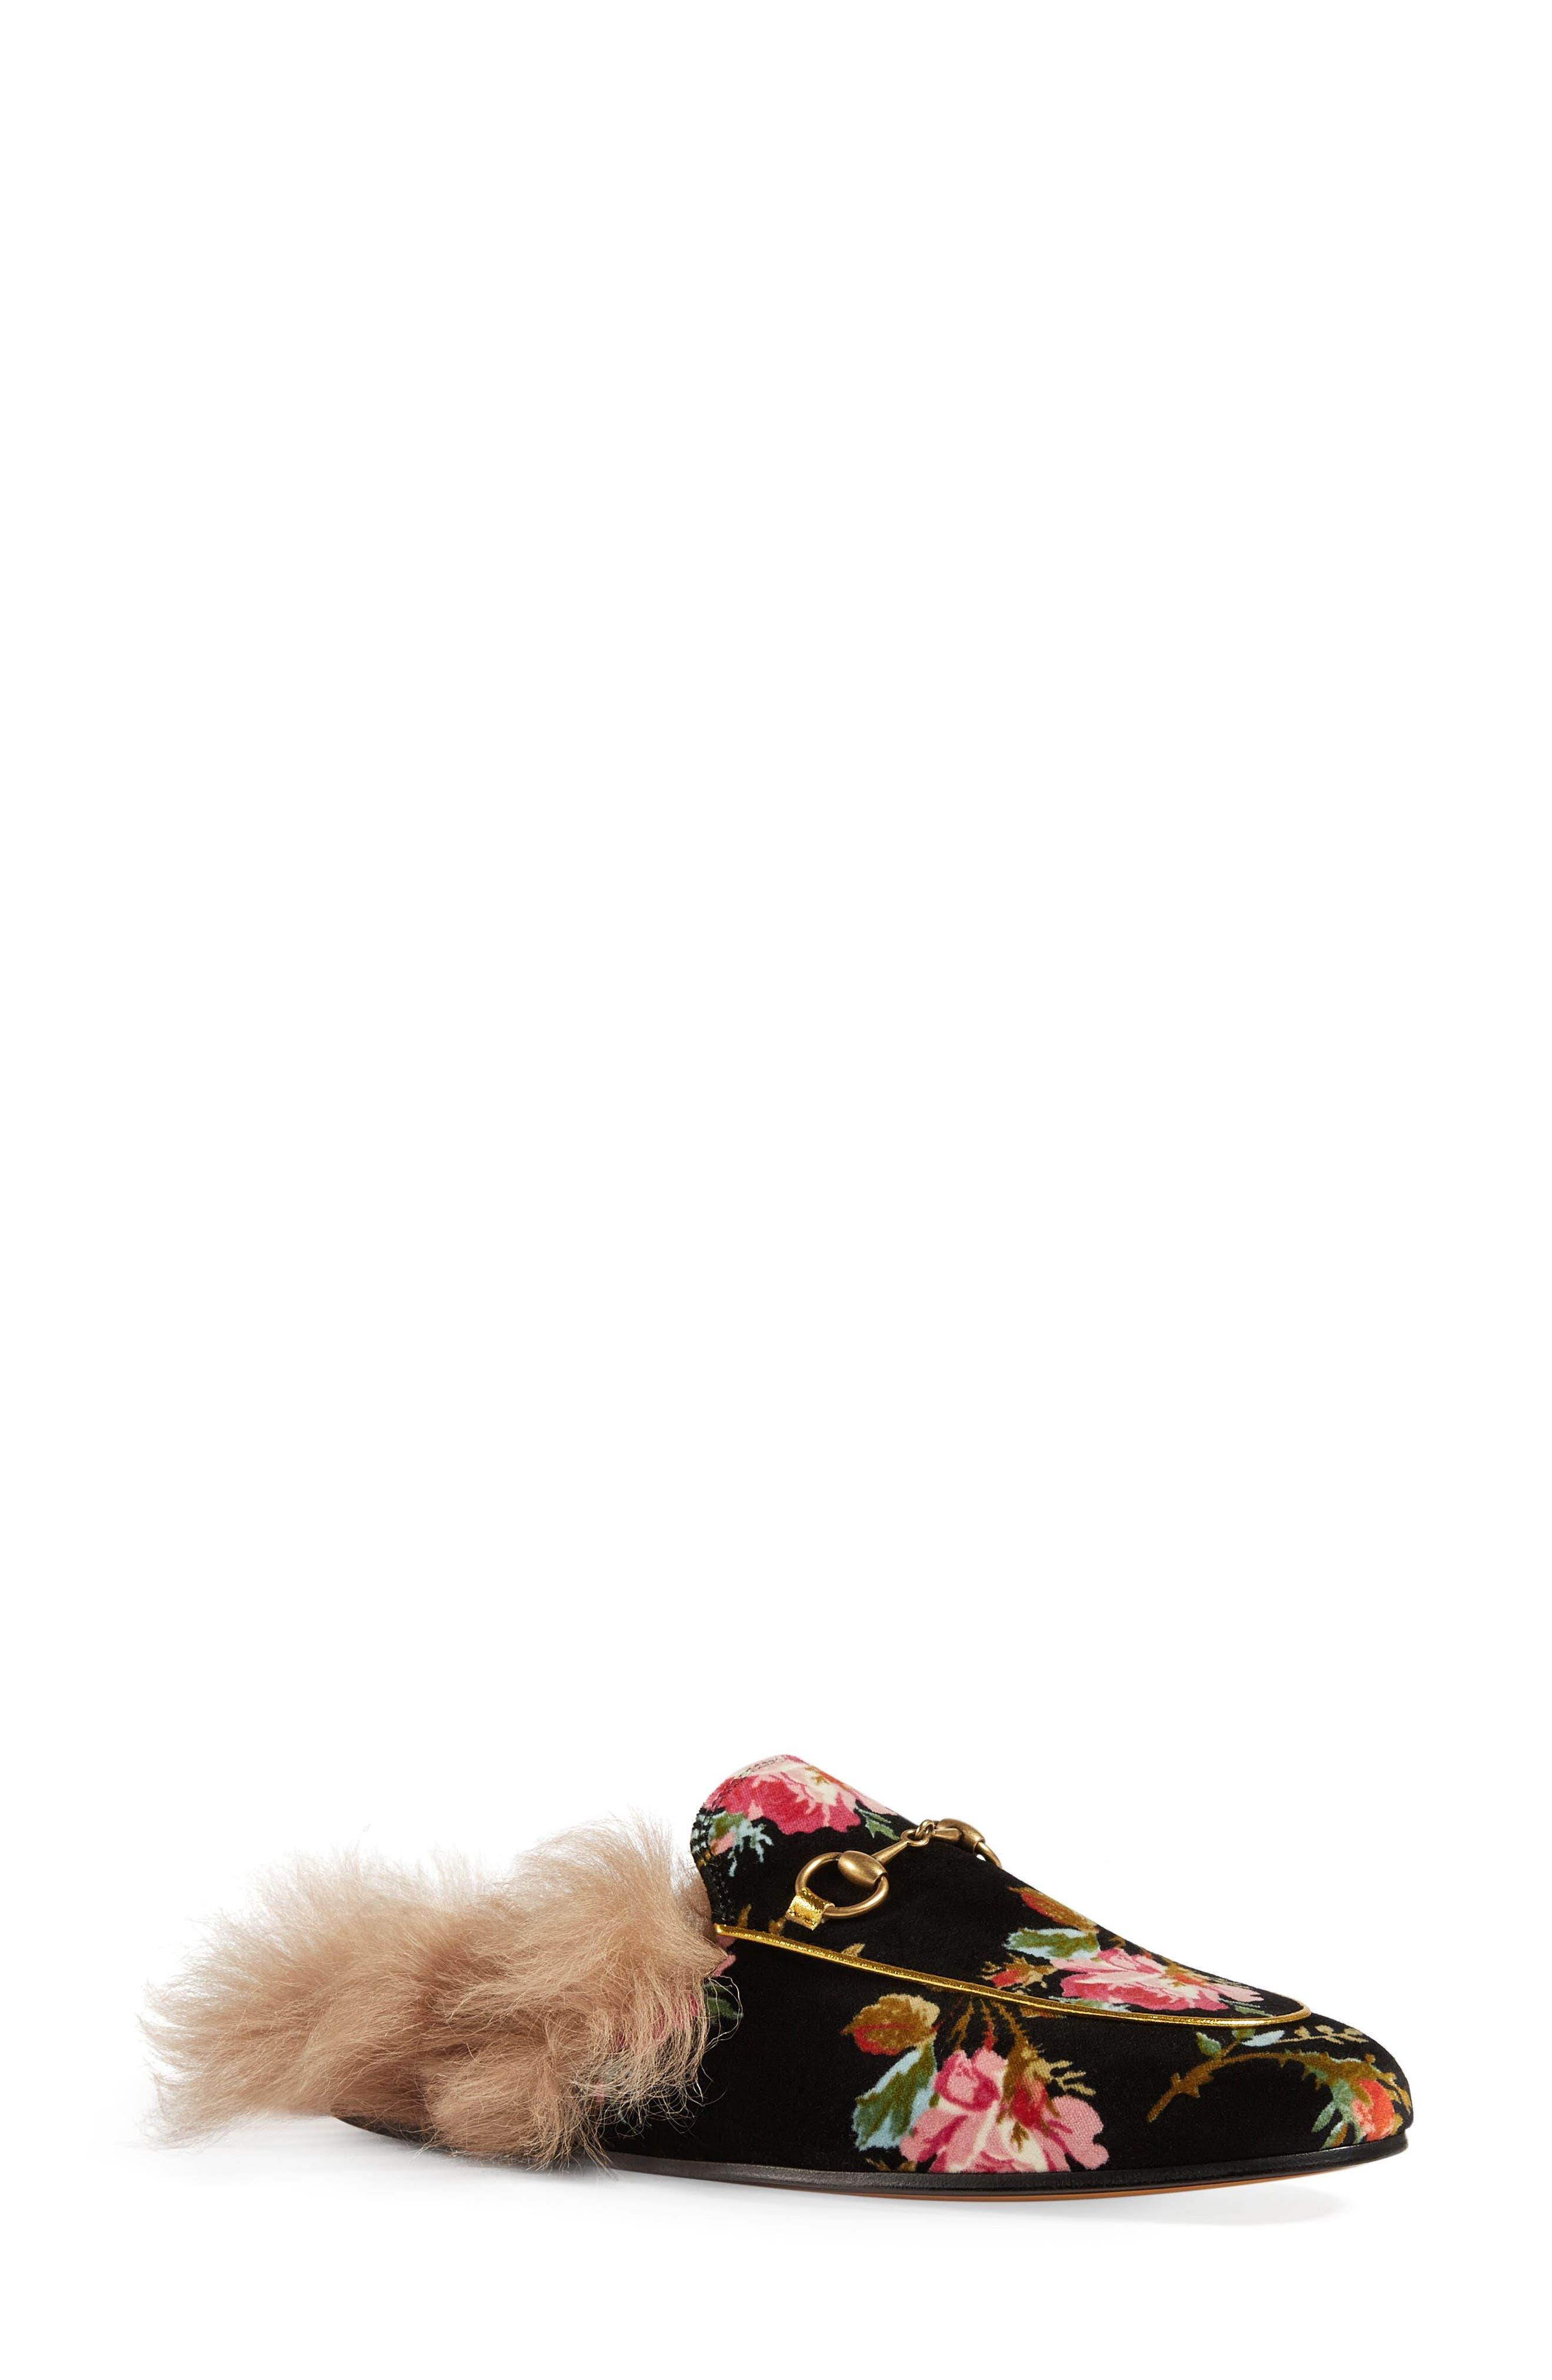 Alternate Image 1 Selected - Gucci Princetown Floral Genuine Shearling Trim Mule (Women)